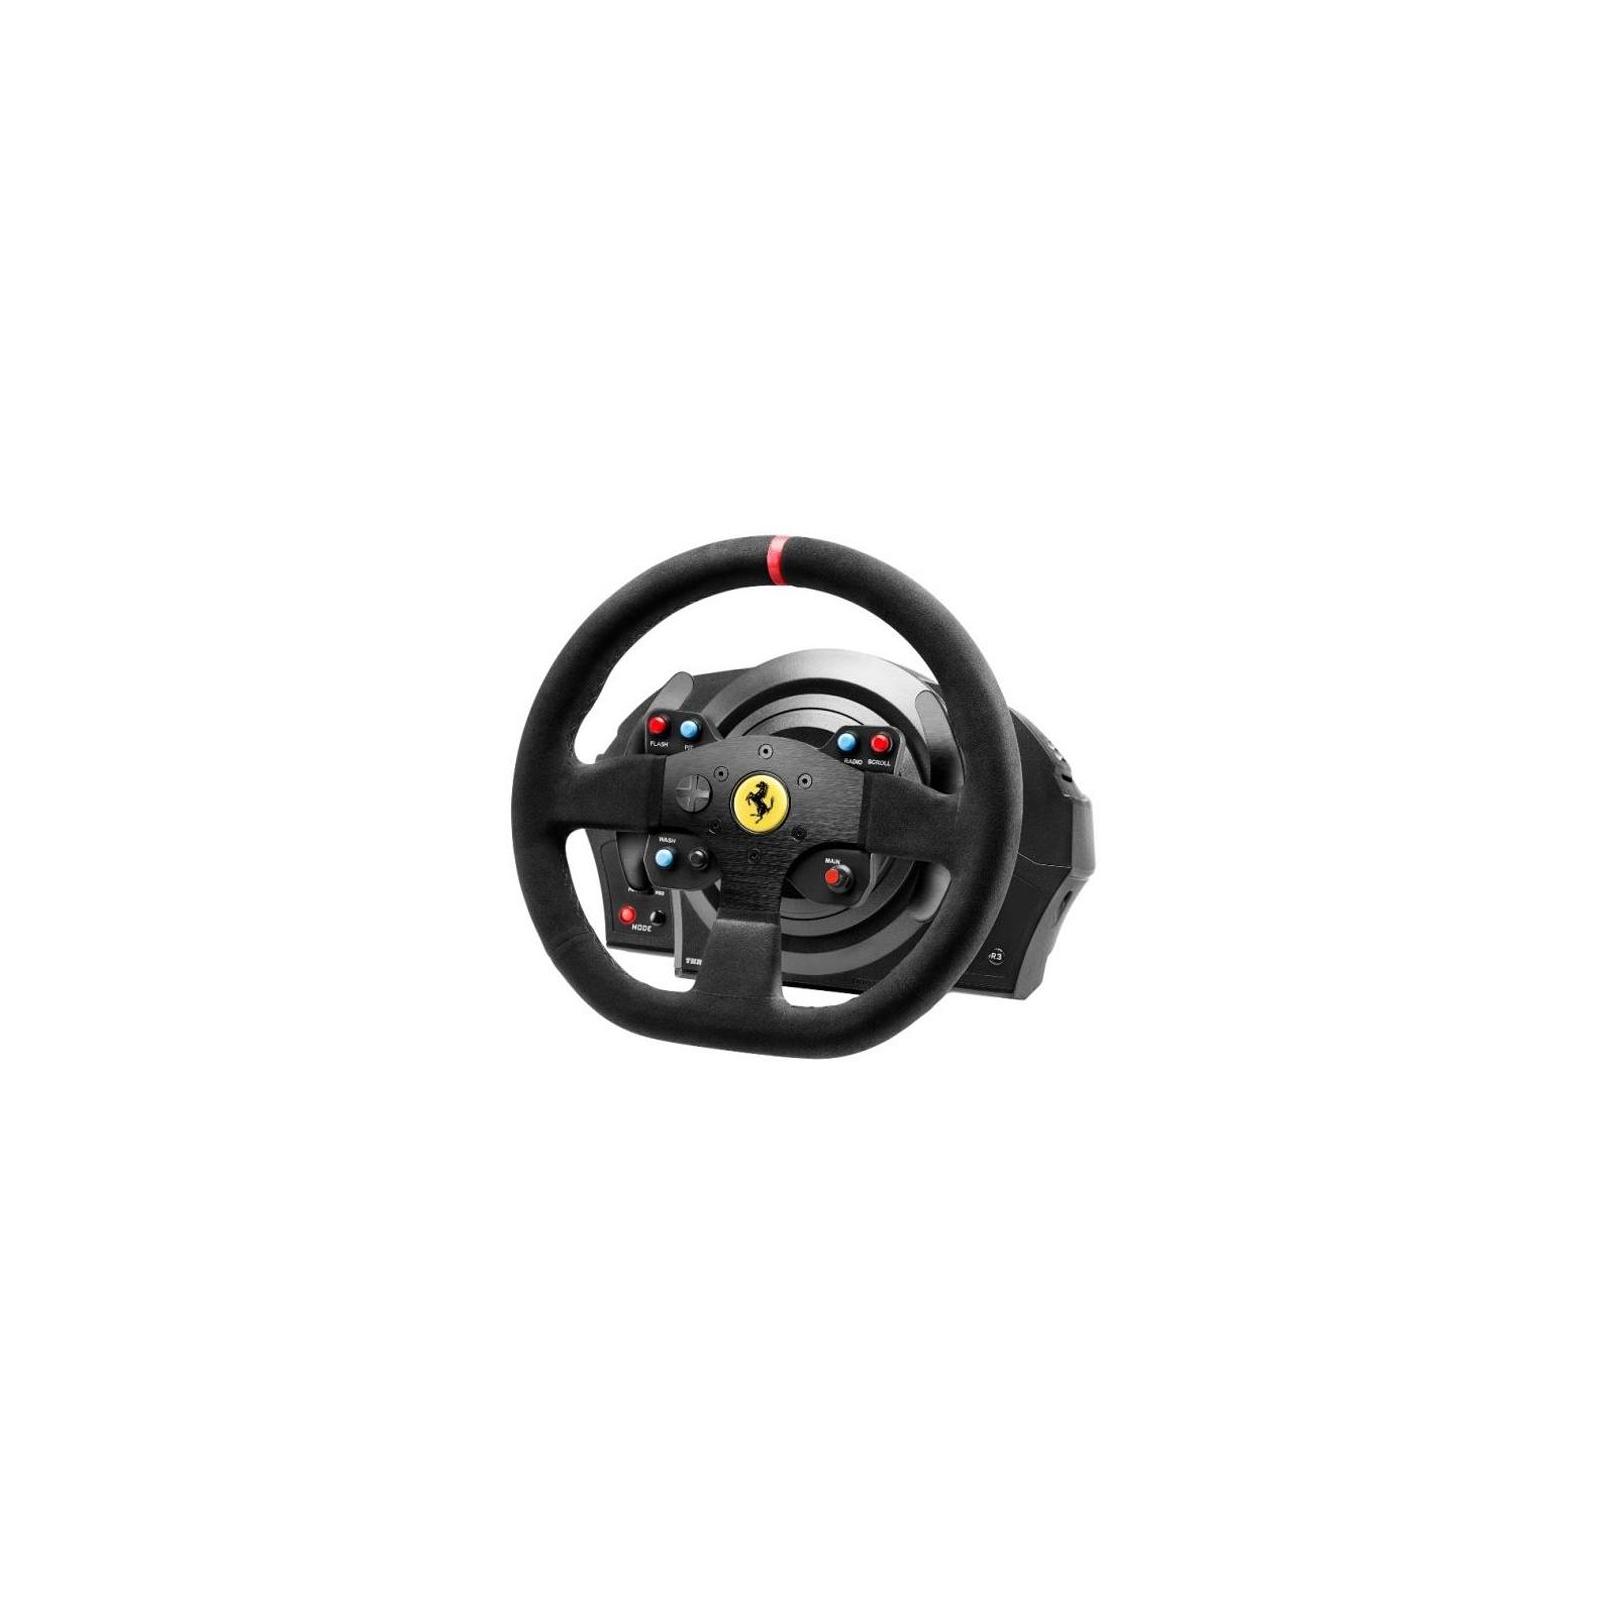 Руль ThrustMaster PC/PS4®/PS3® T300 Ferrari Integral RW Alcantara edition (4160652) изображение 2